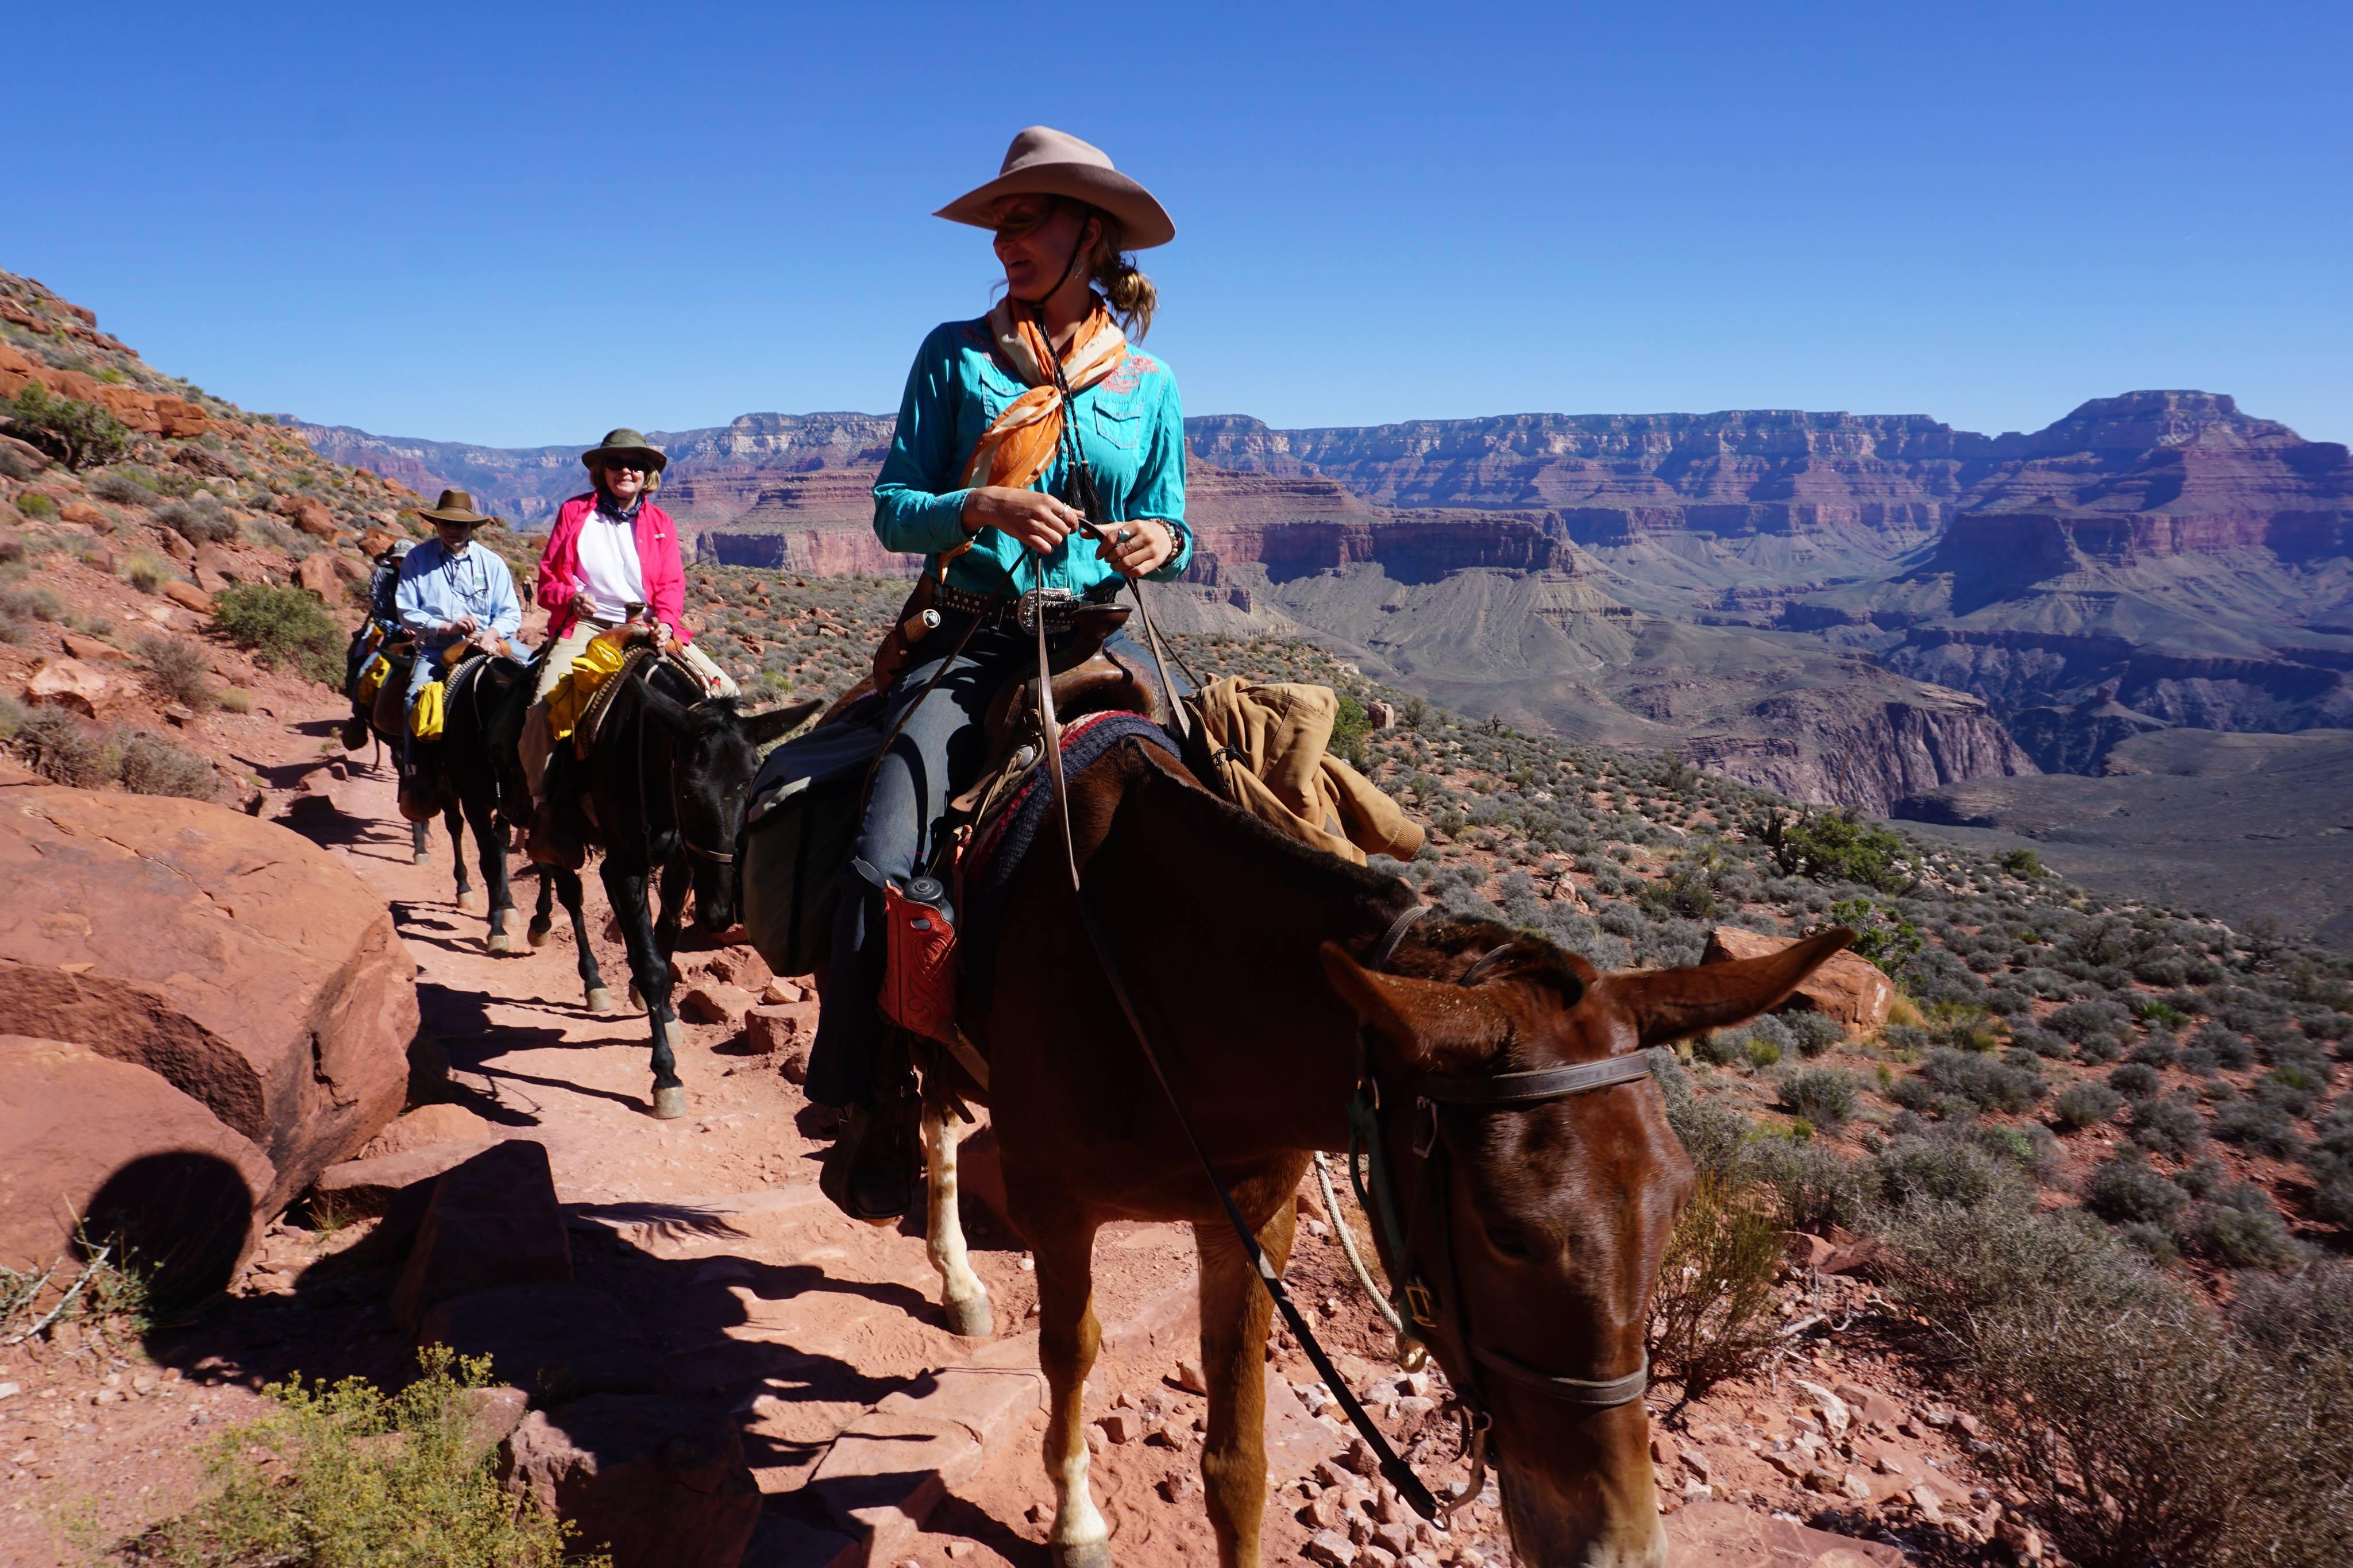 Grand canyon på mulddyr